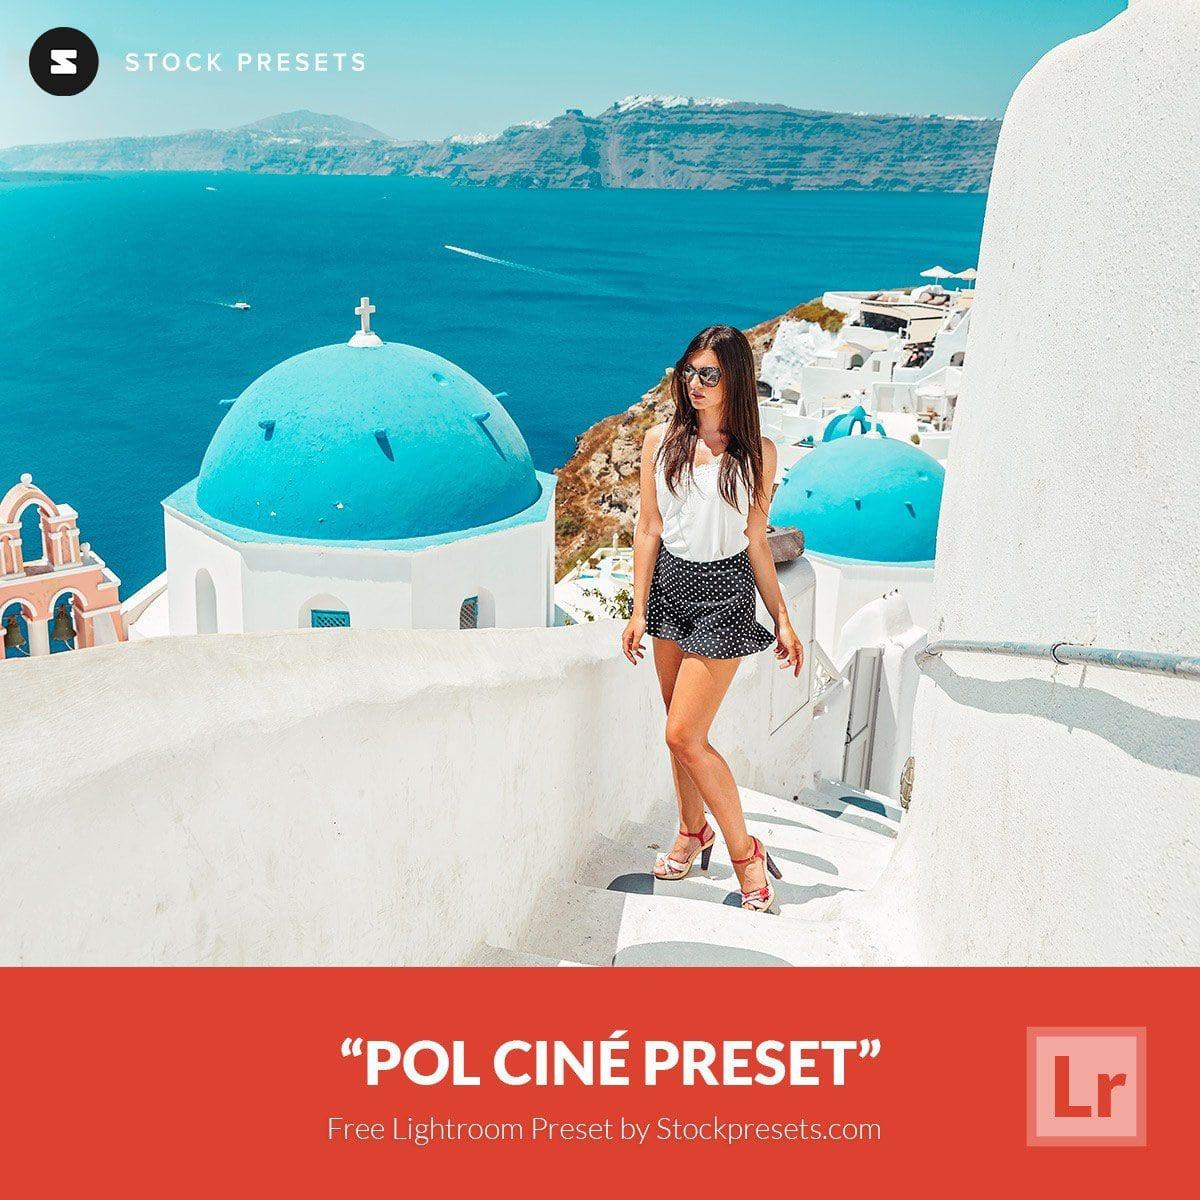 Free-Lightroom-Preset-POL-Cine-Film-Preset-Stockpresets.com